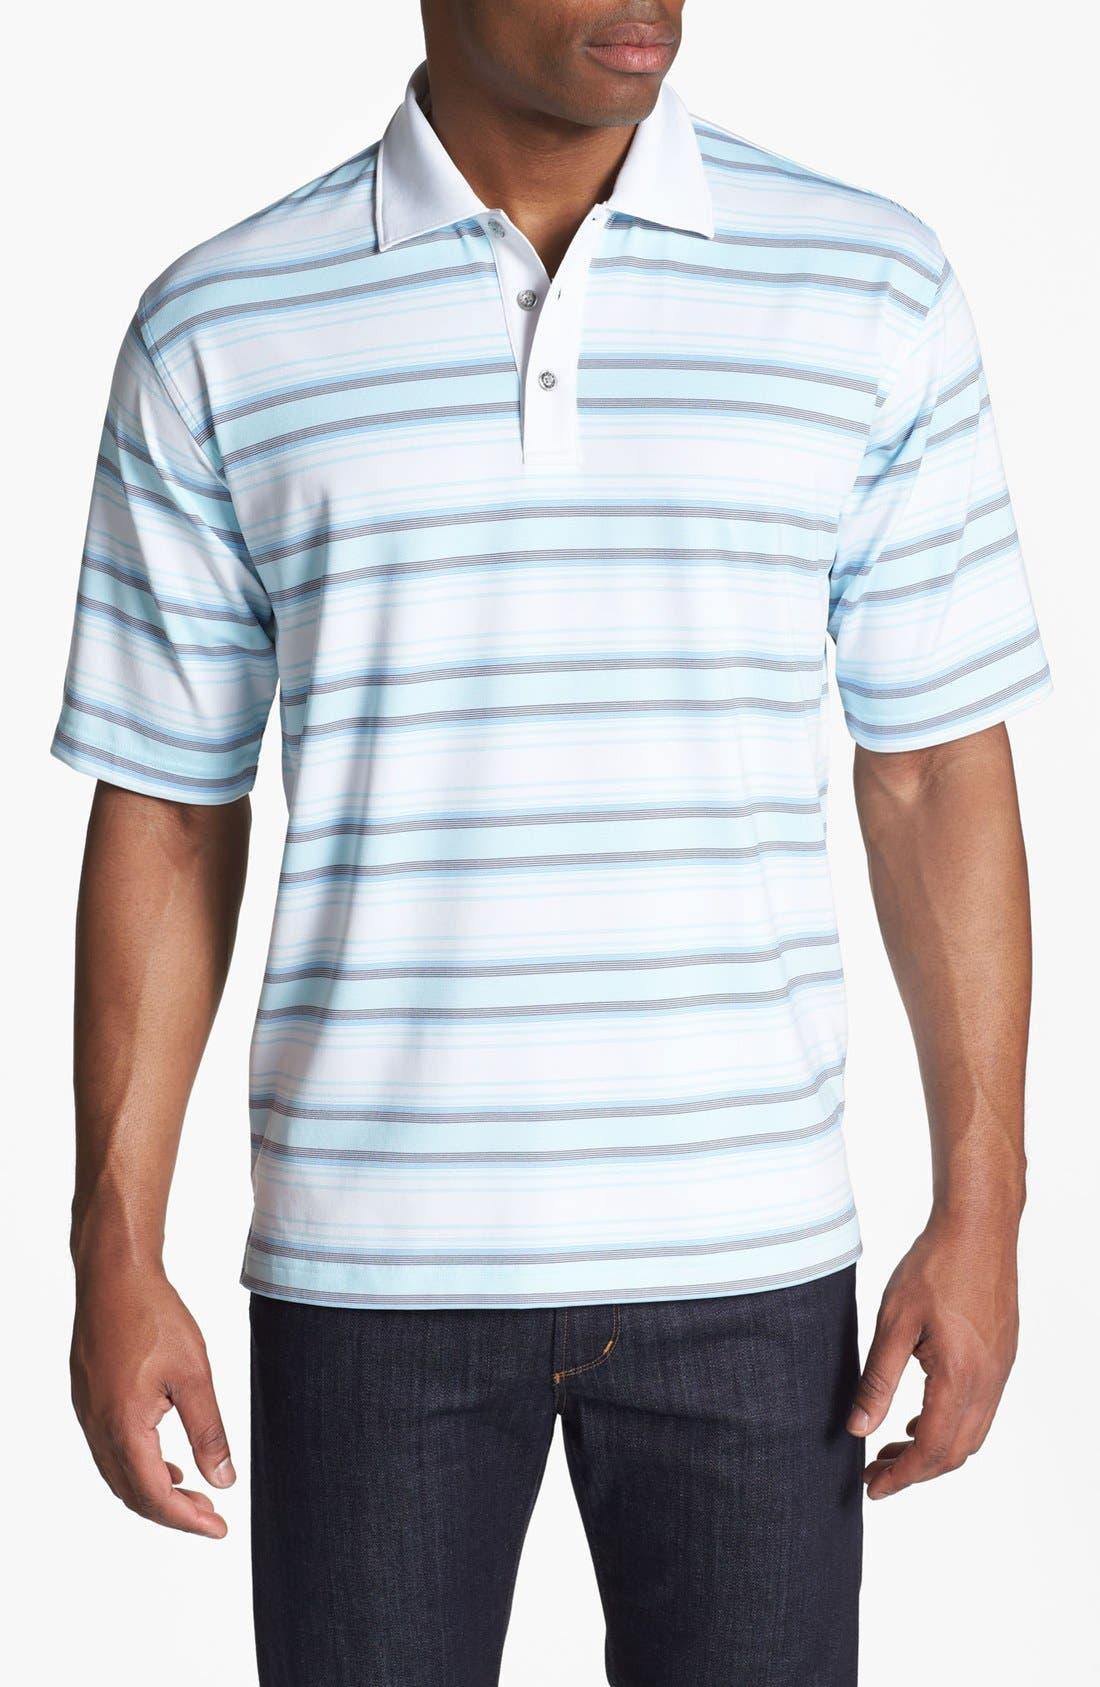 Main Image - Lone Cypress Pebble Beach Striped Polo Shirt